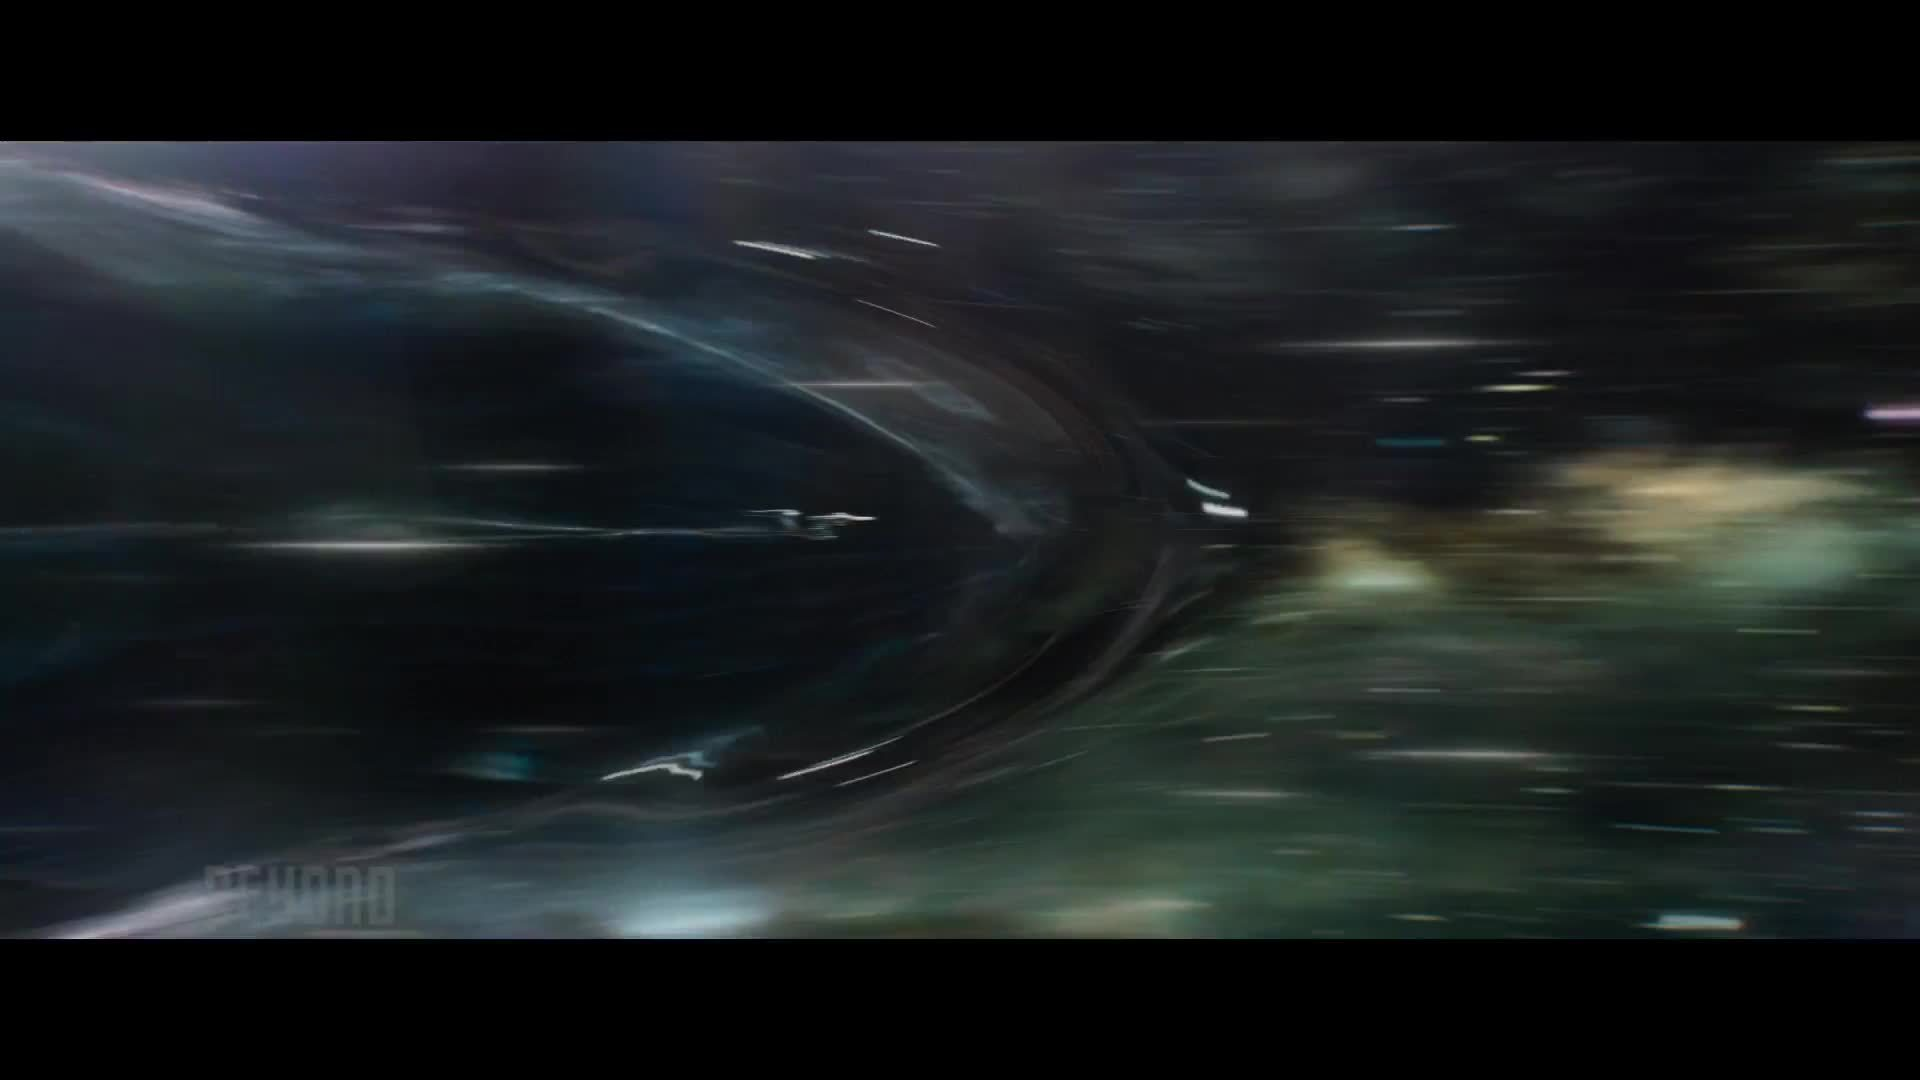 best of star trek enterprise animated gifs best animations - HD1920×790